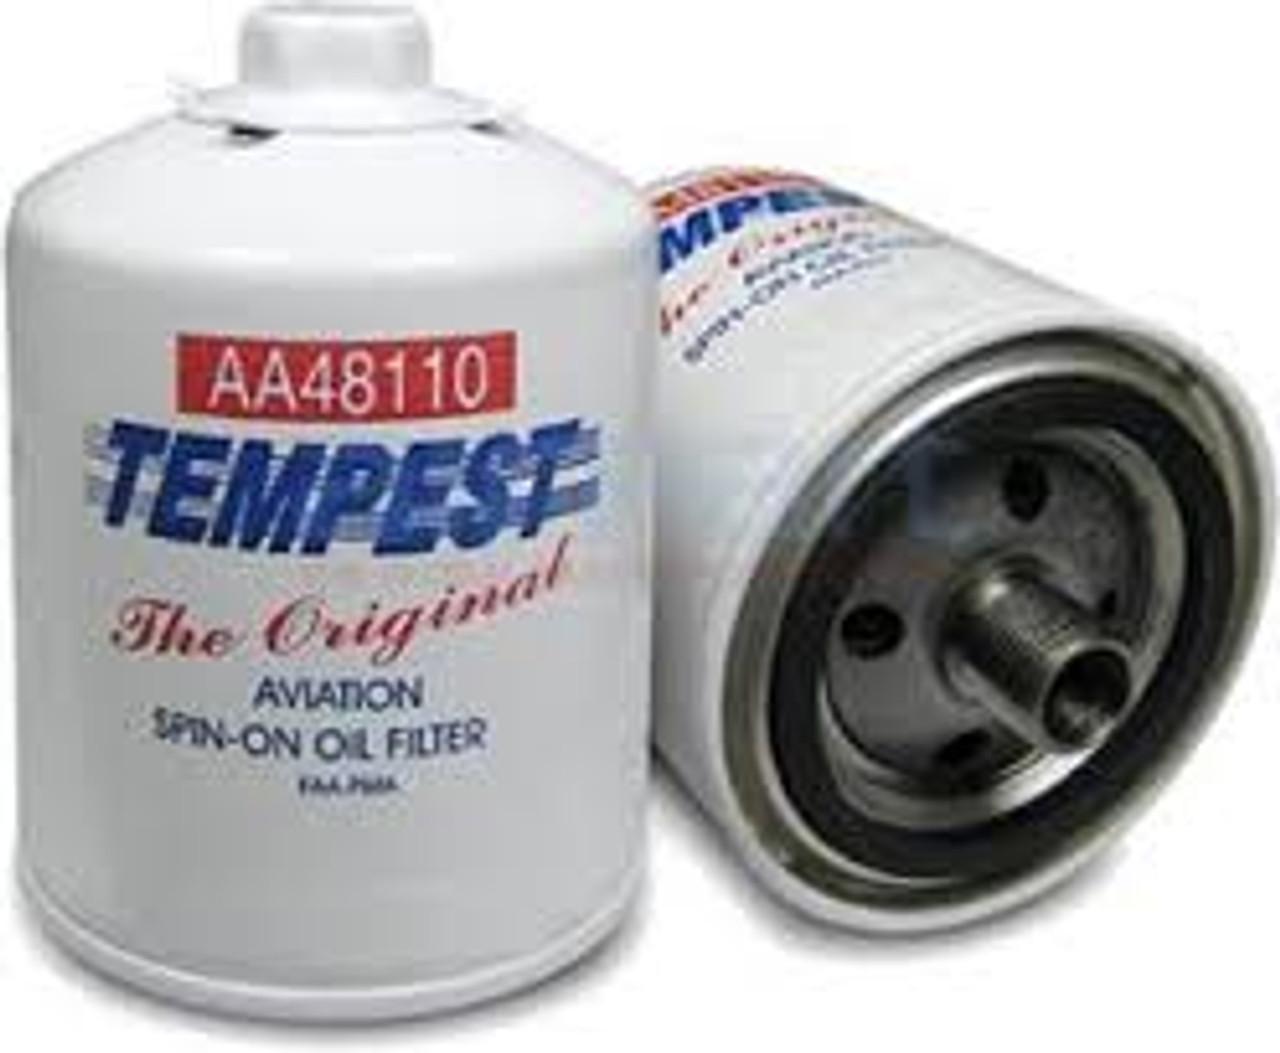 AA48110-2 Tempest Oil Filter